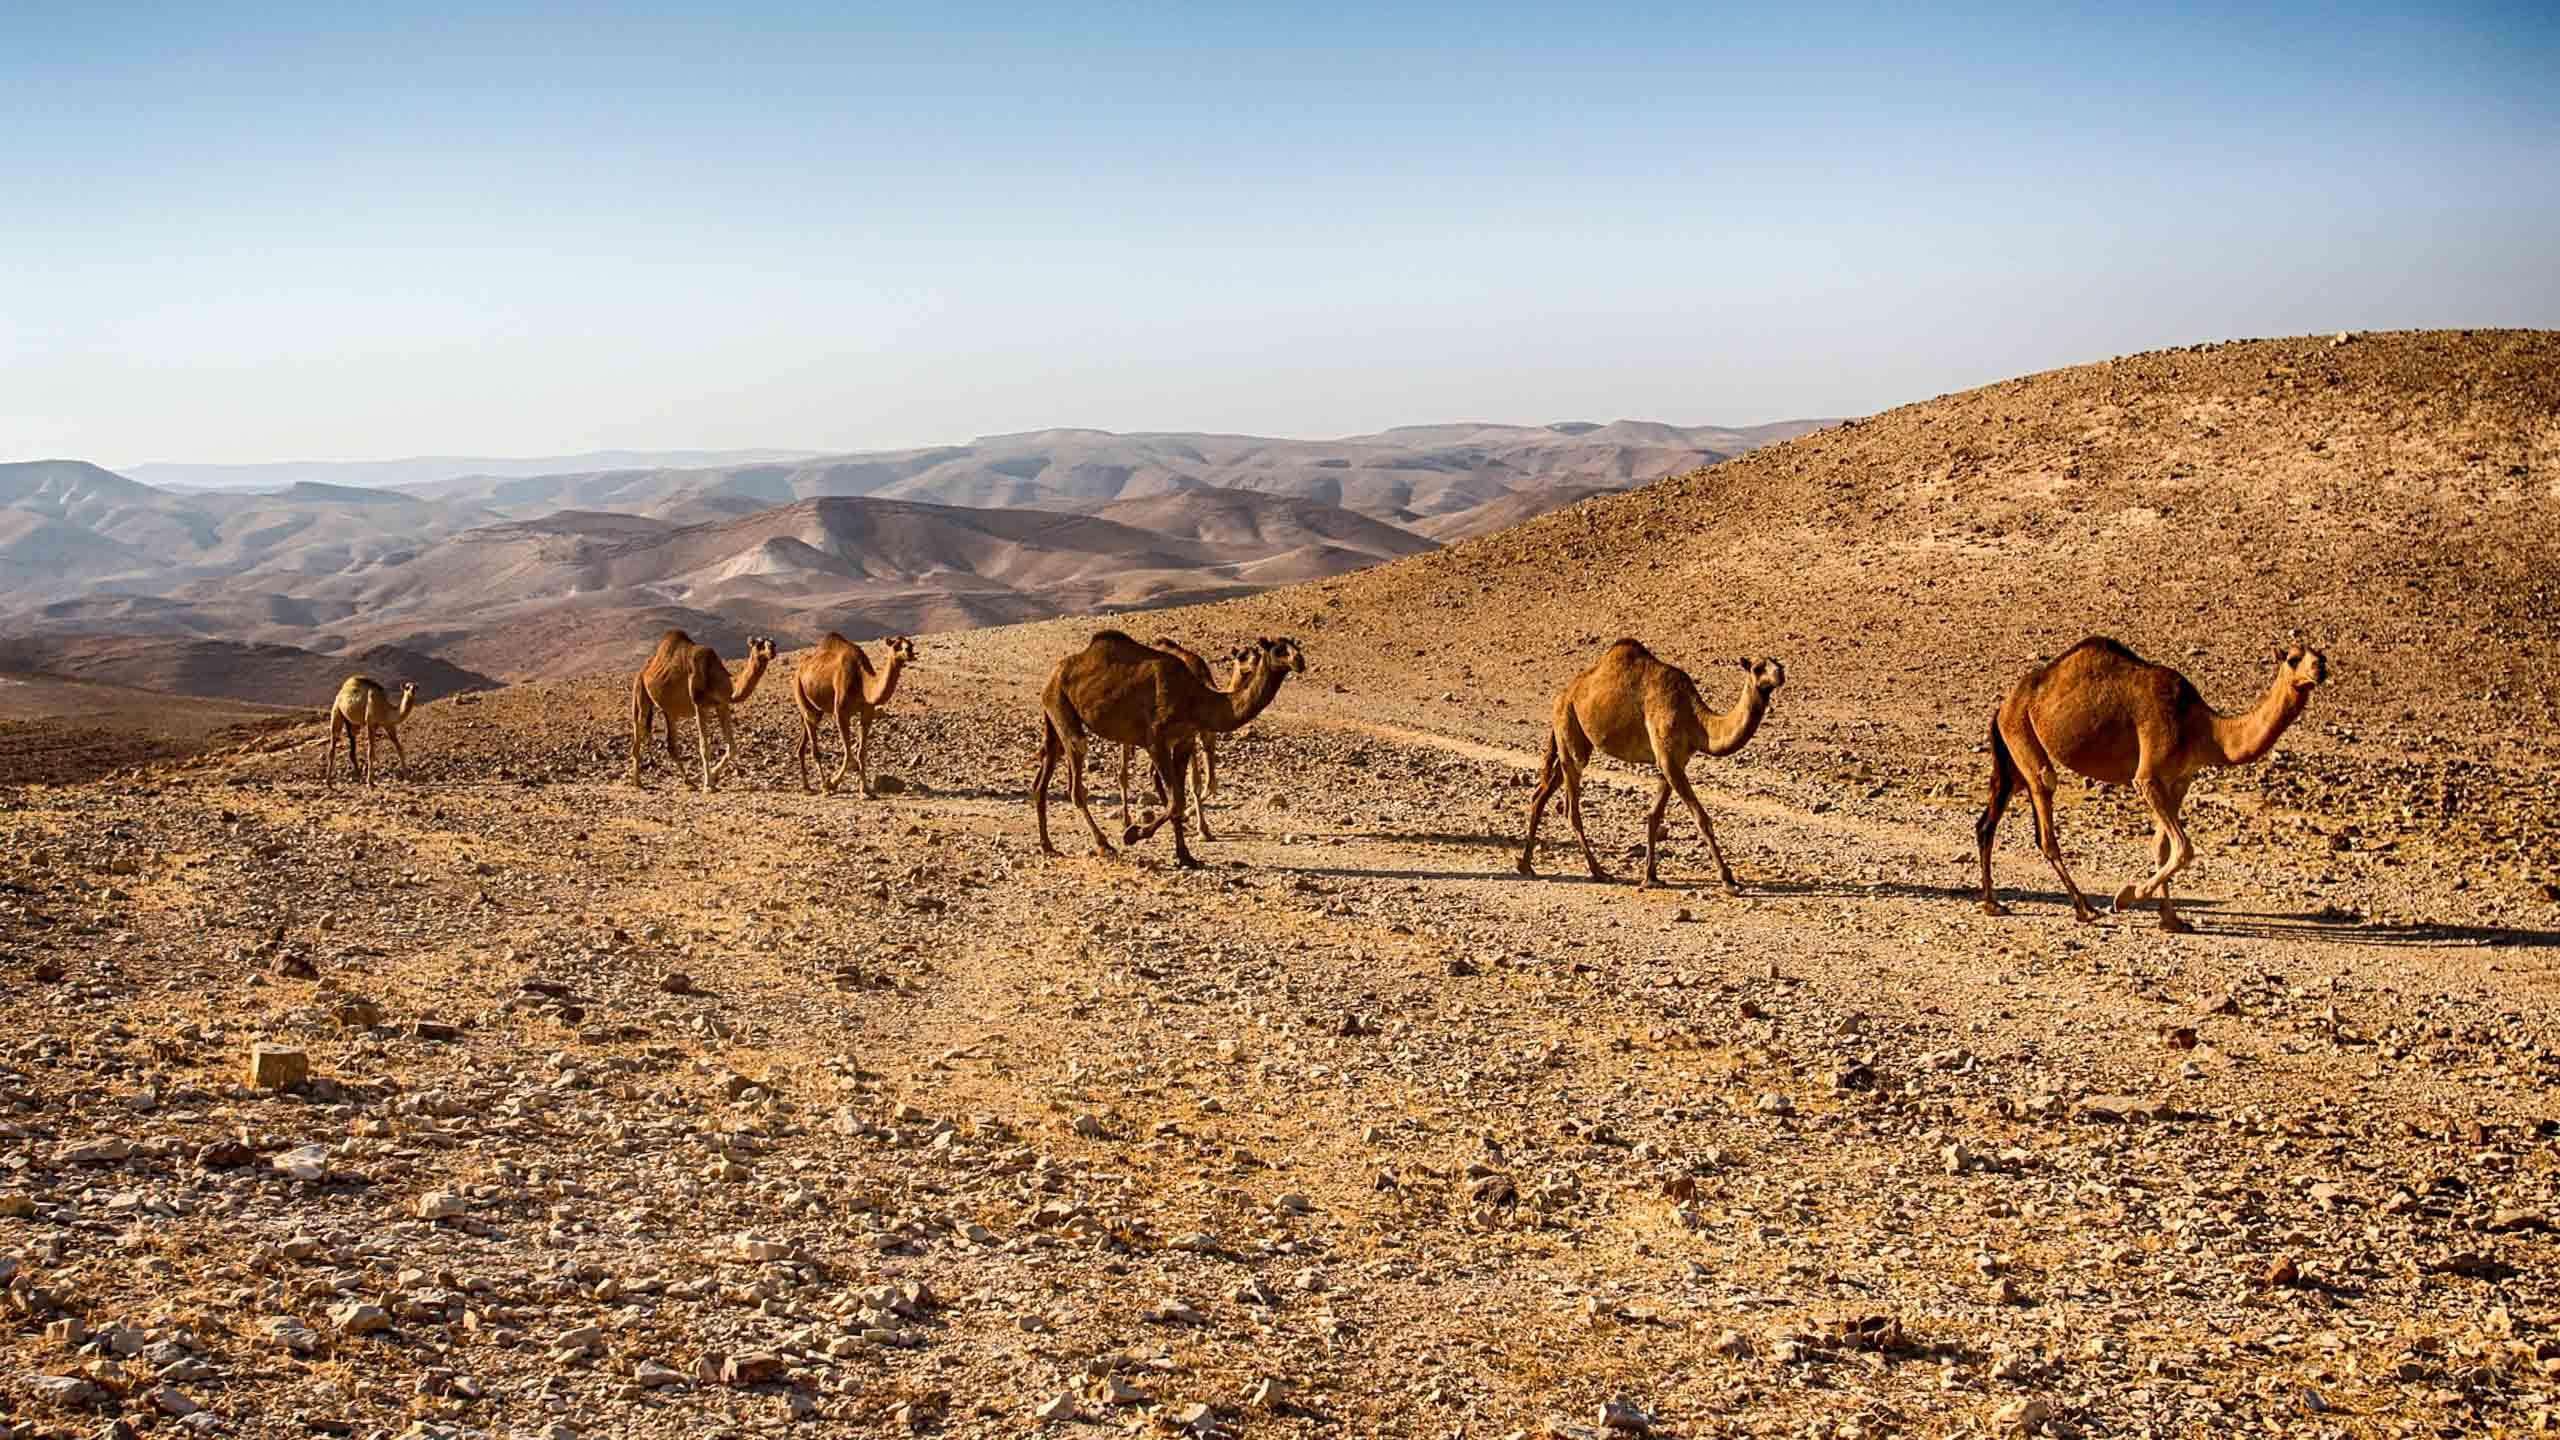 Camels walk in a line in Israel desert